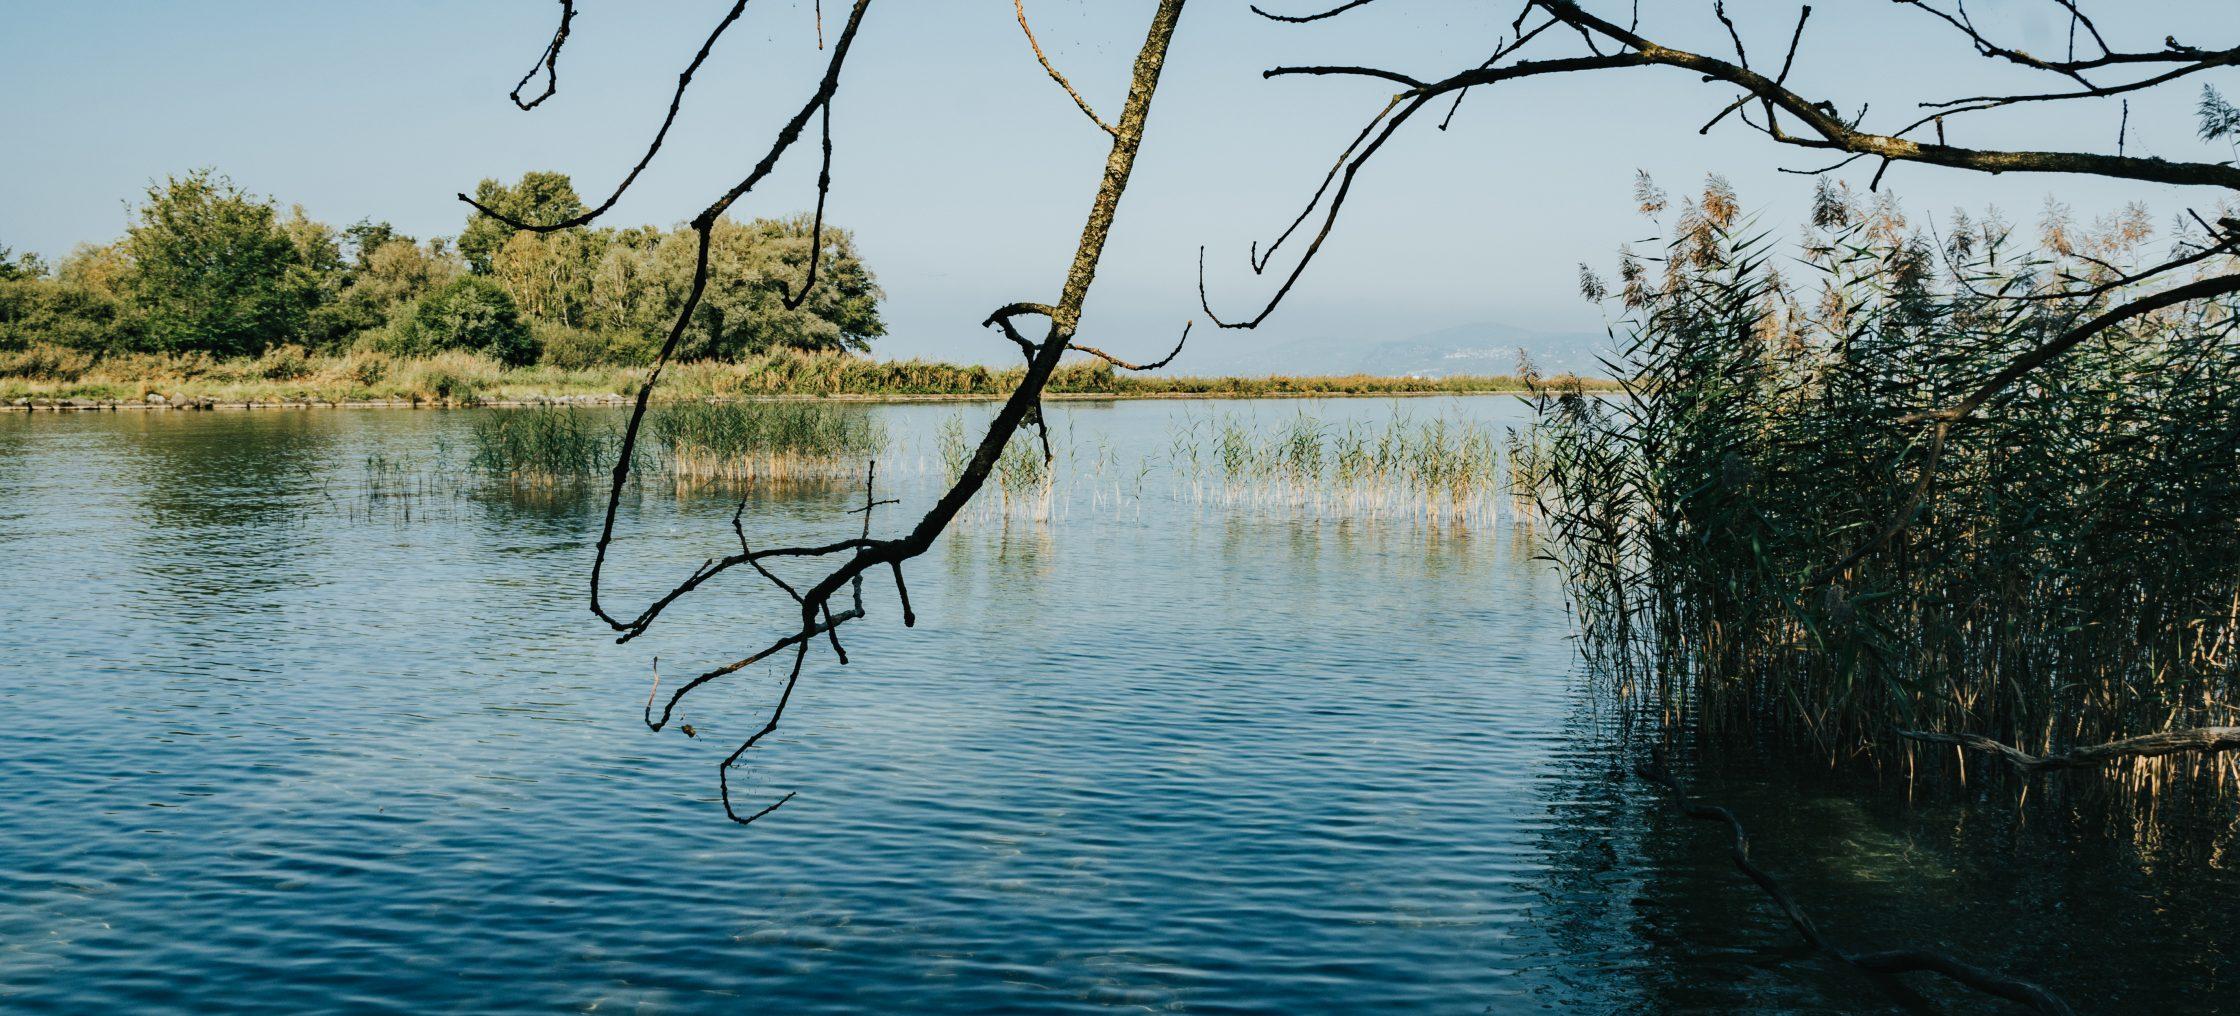 spatzieren naturschutzgebiet les grangettes scaled